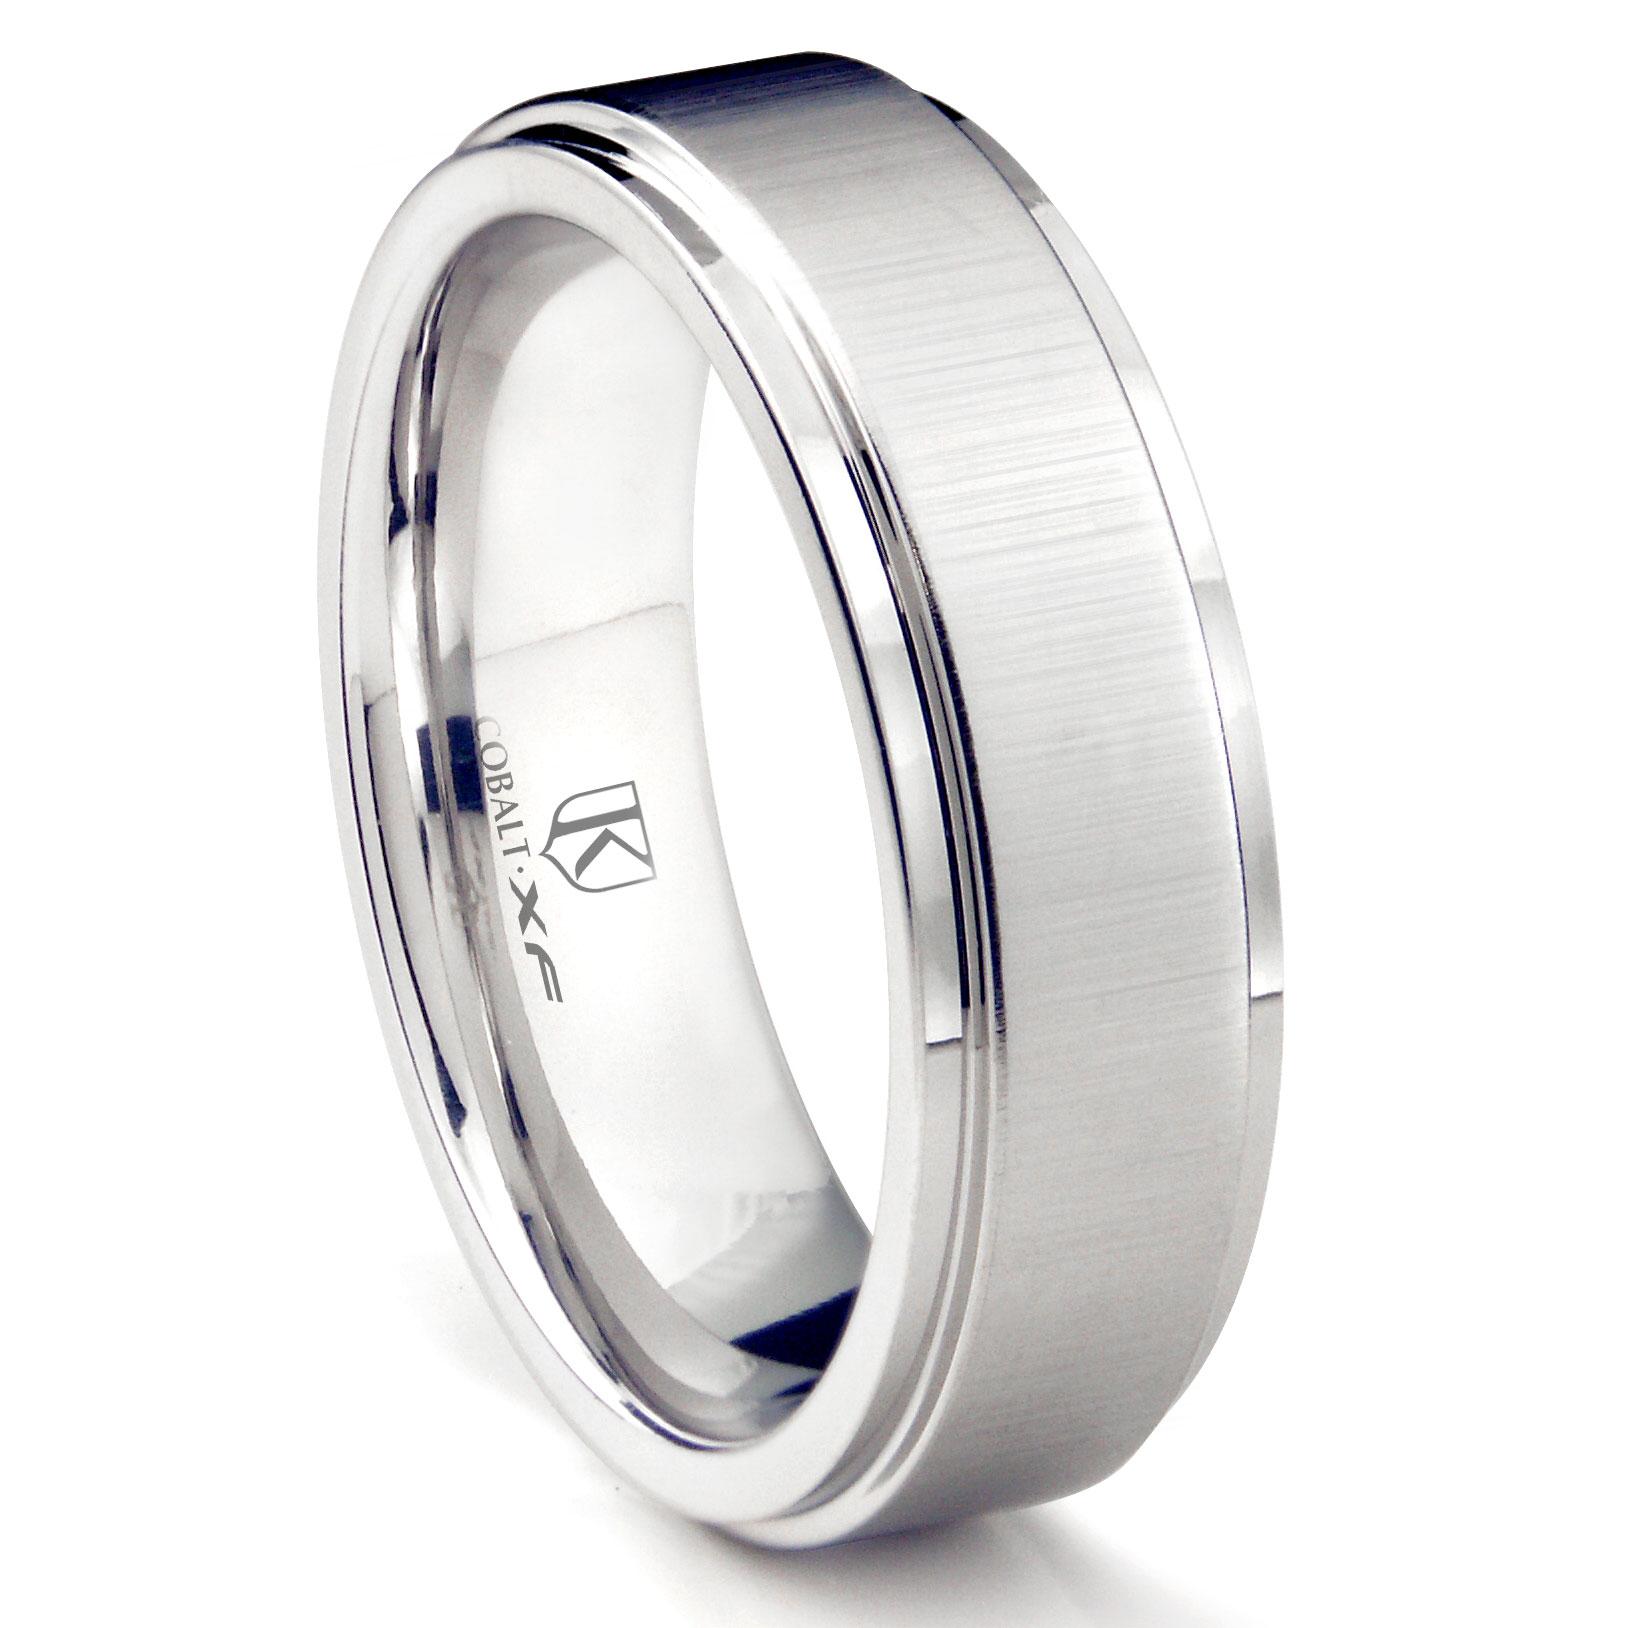 Cobalt XF Chrome 8MM Satin Finish Wedding Band Ring W Raised Center